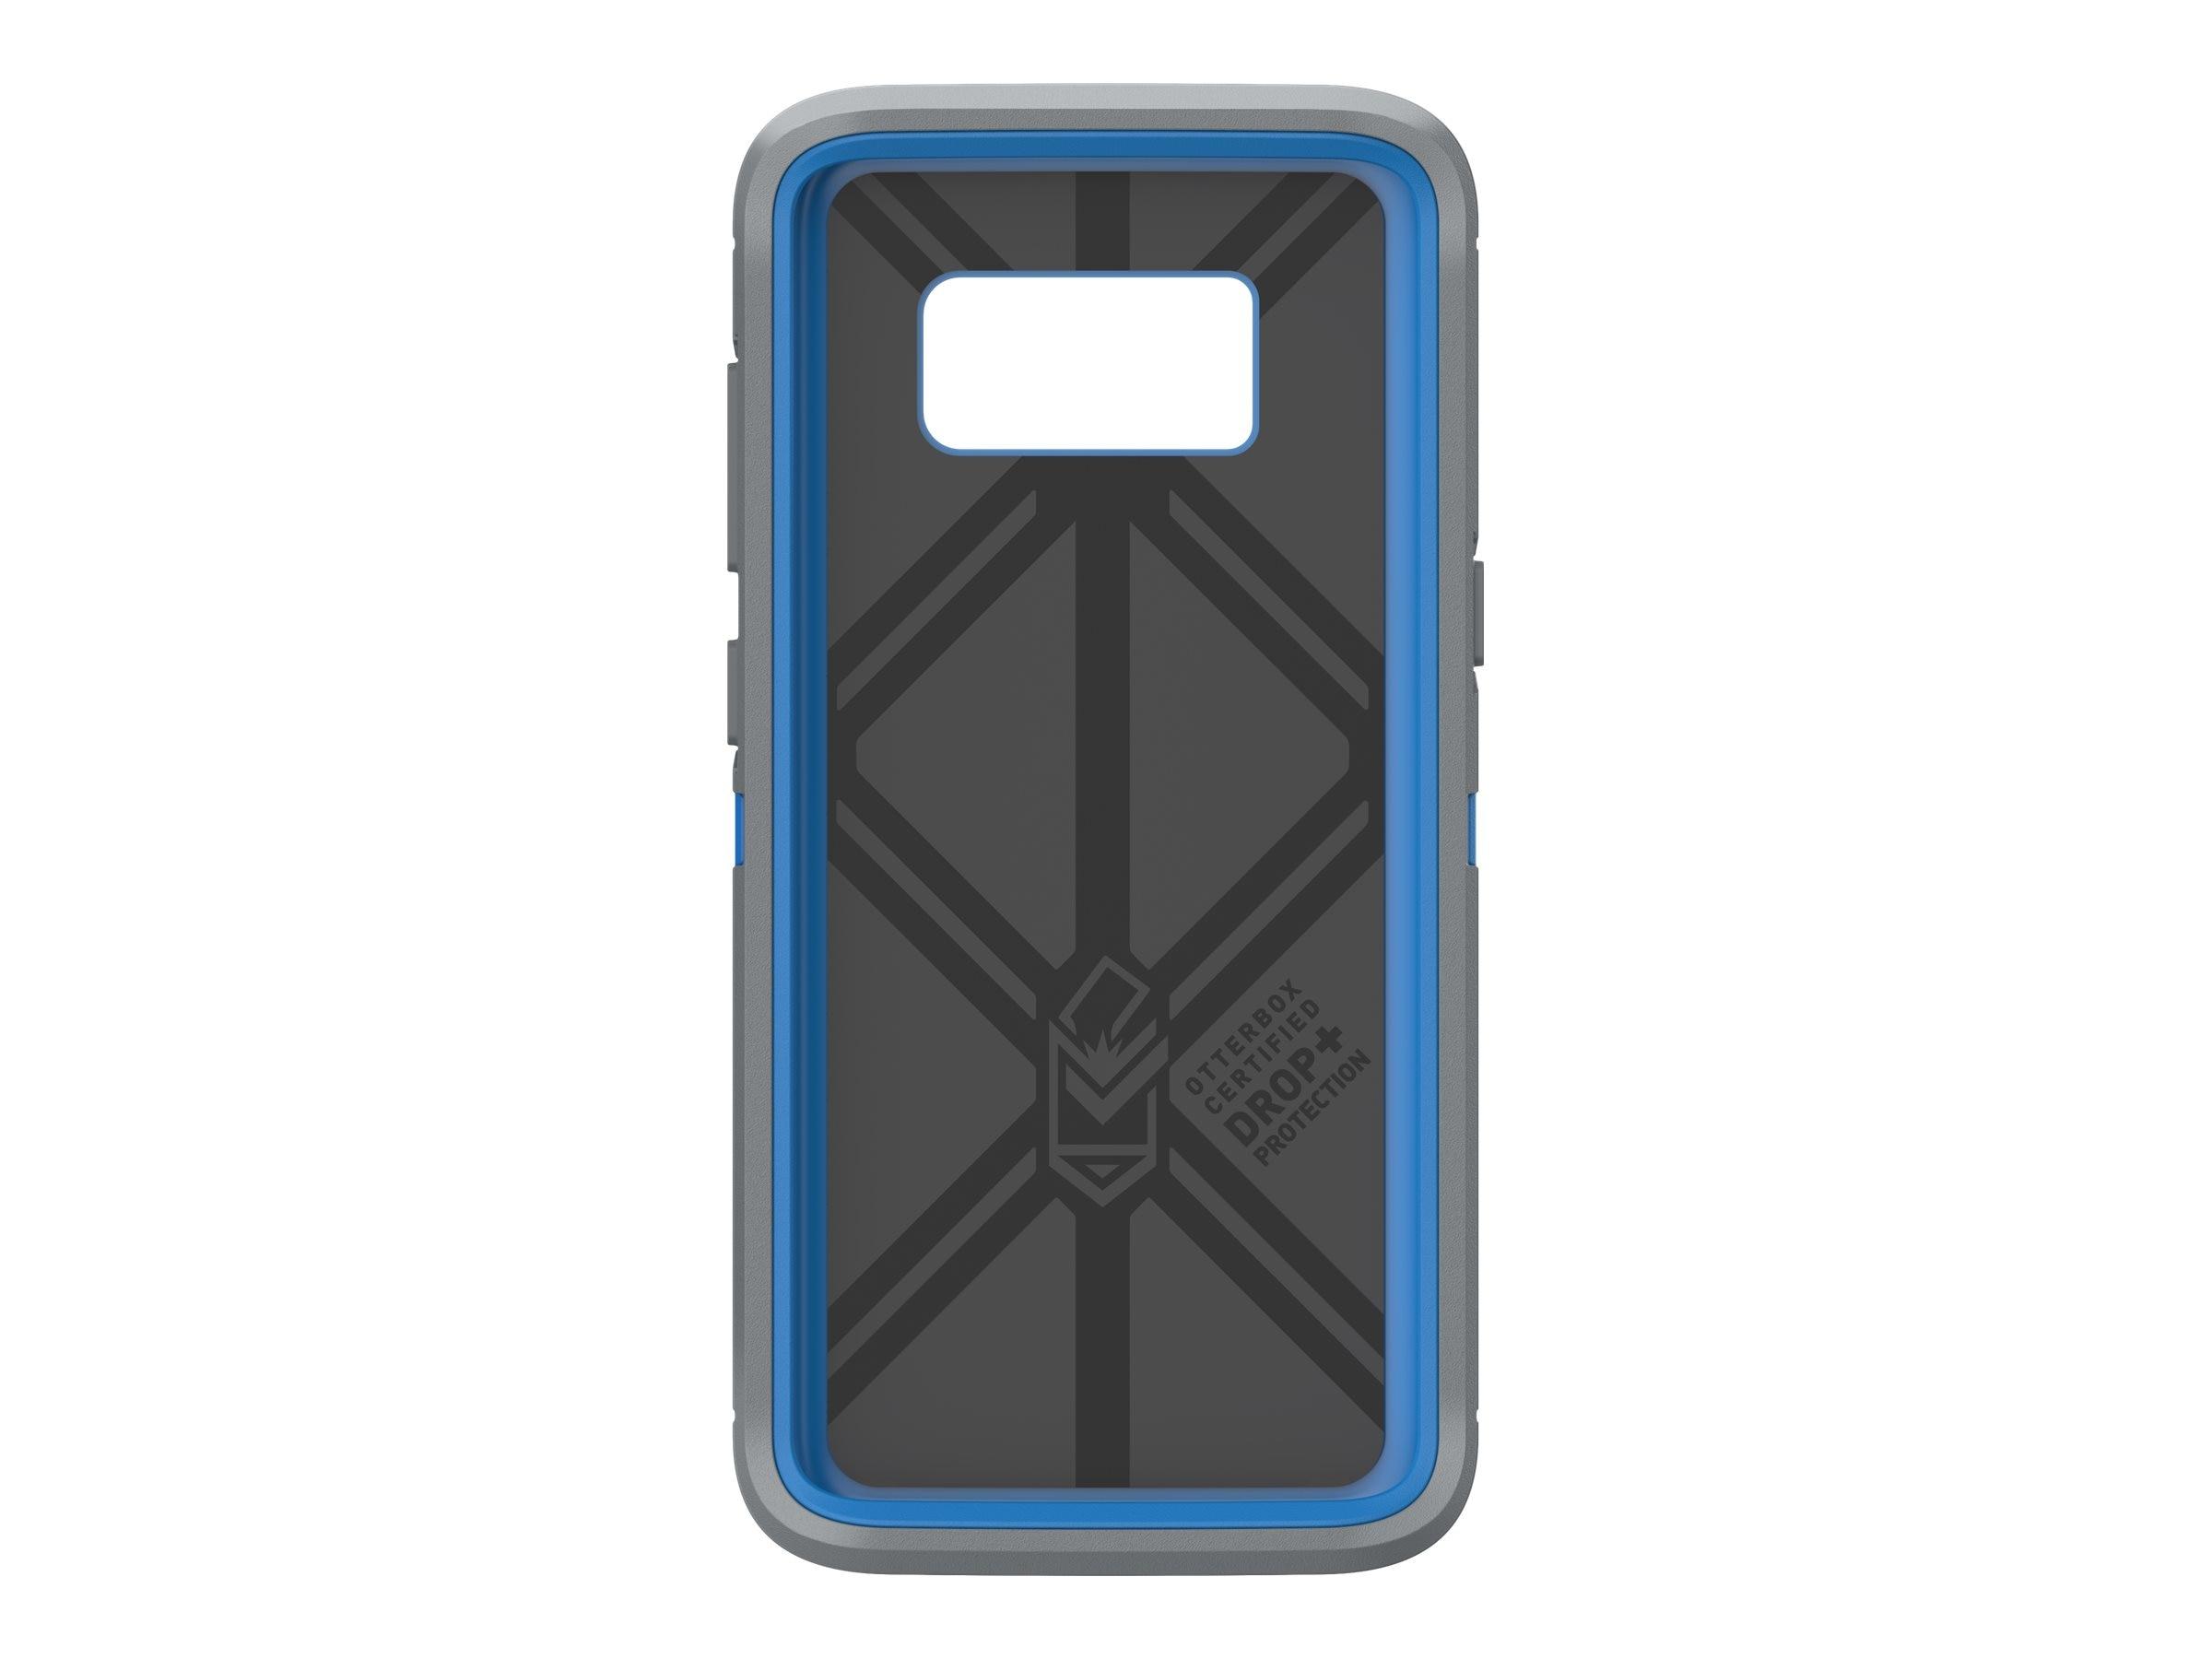 detailed look 1b057 9f6d8 OtterBox Defender Series Screenless Edition Case for Samsung Galaxy S8,  Marathoner